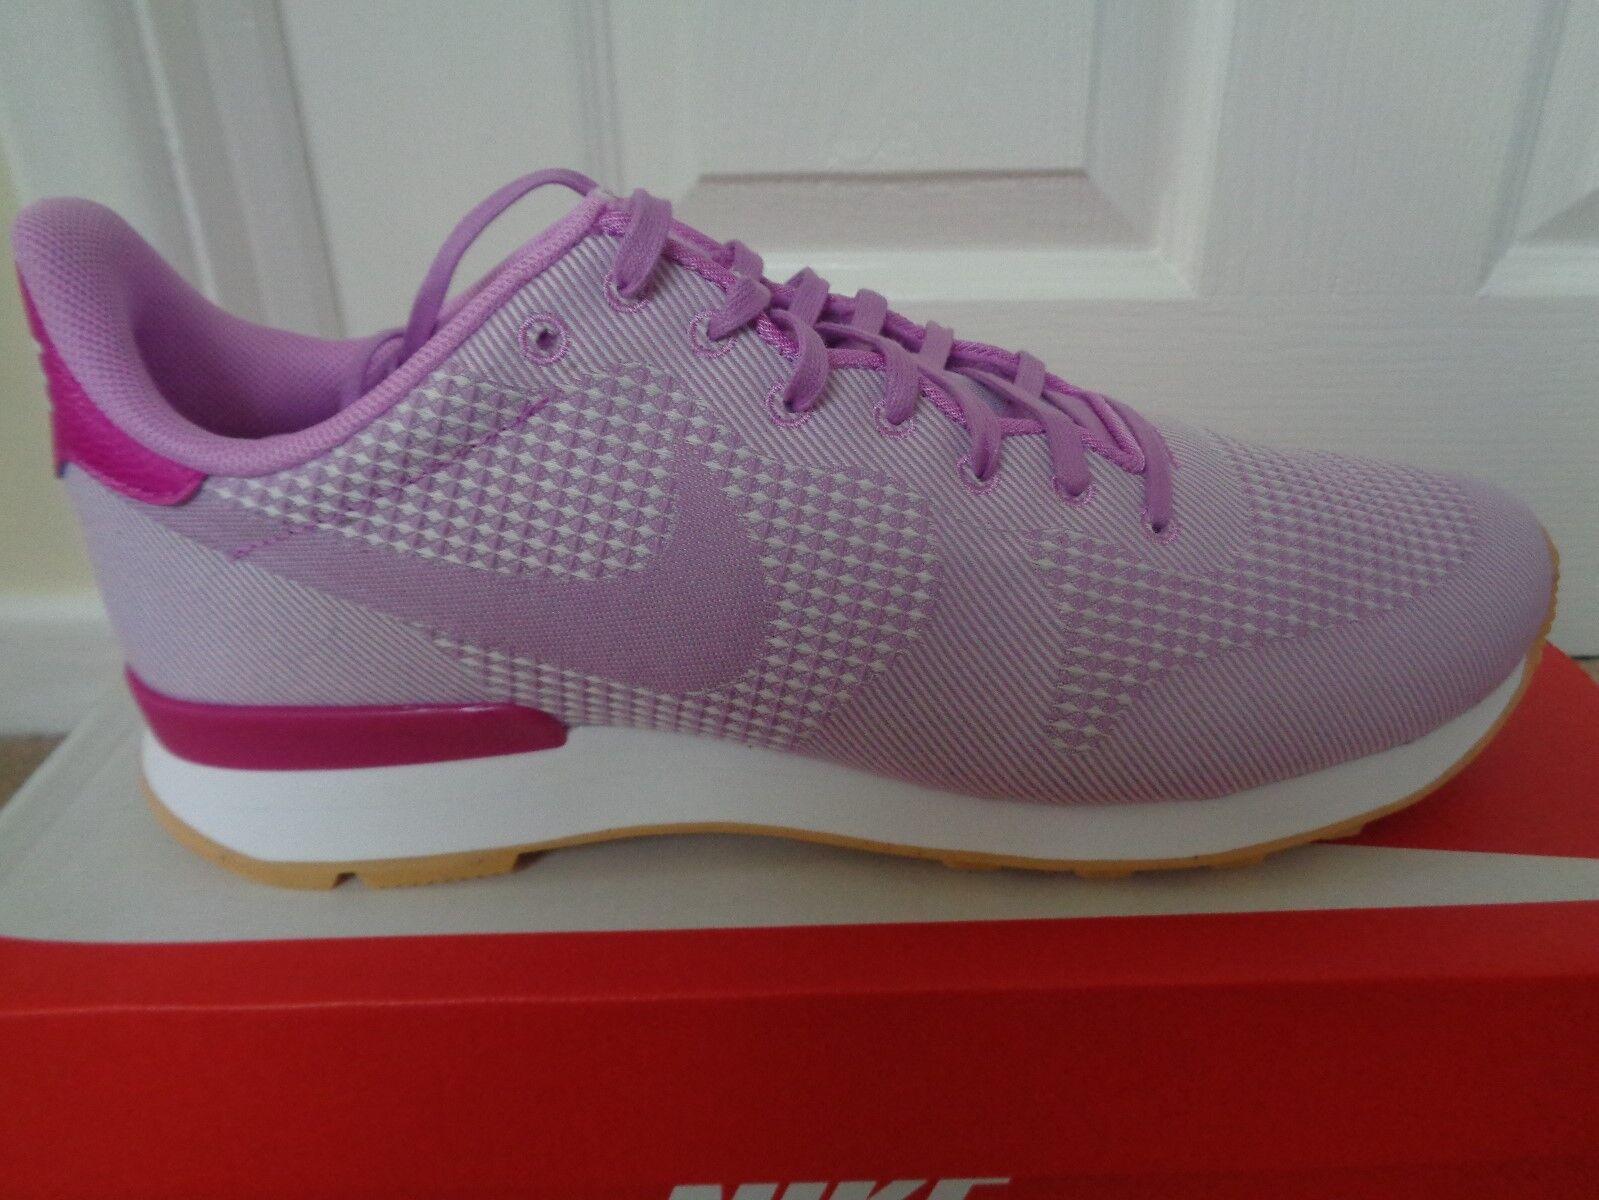 Nike Internationalist JCRD trainers sneakers 705215 500 uk 7 eu 41 us 9.5 NEW